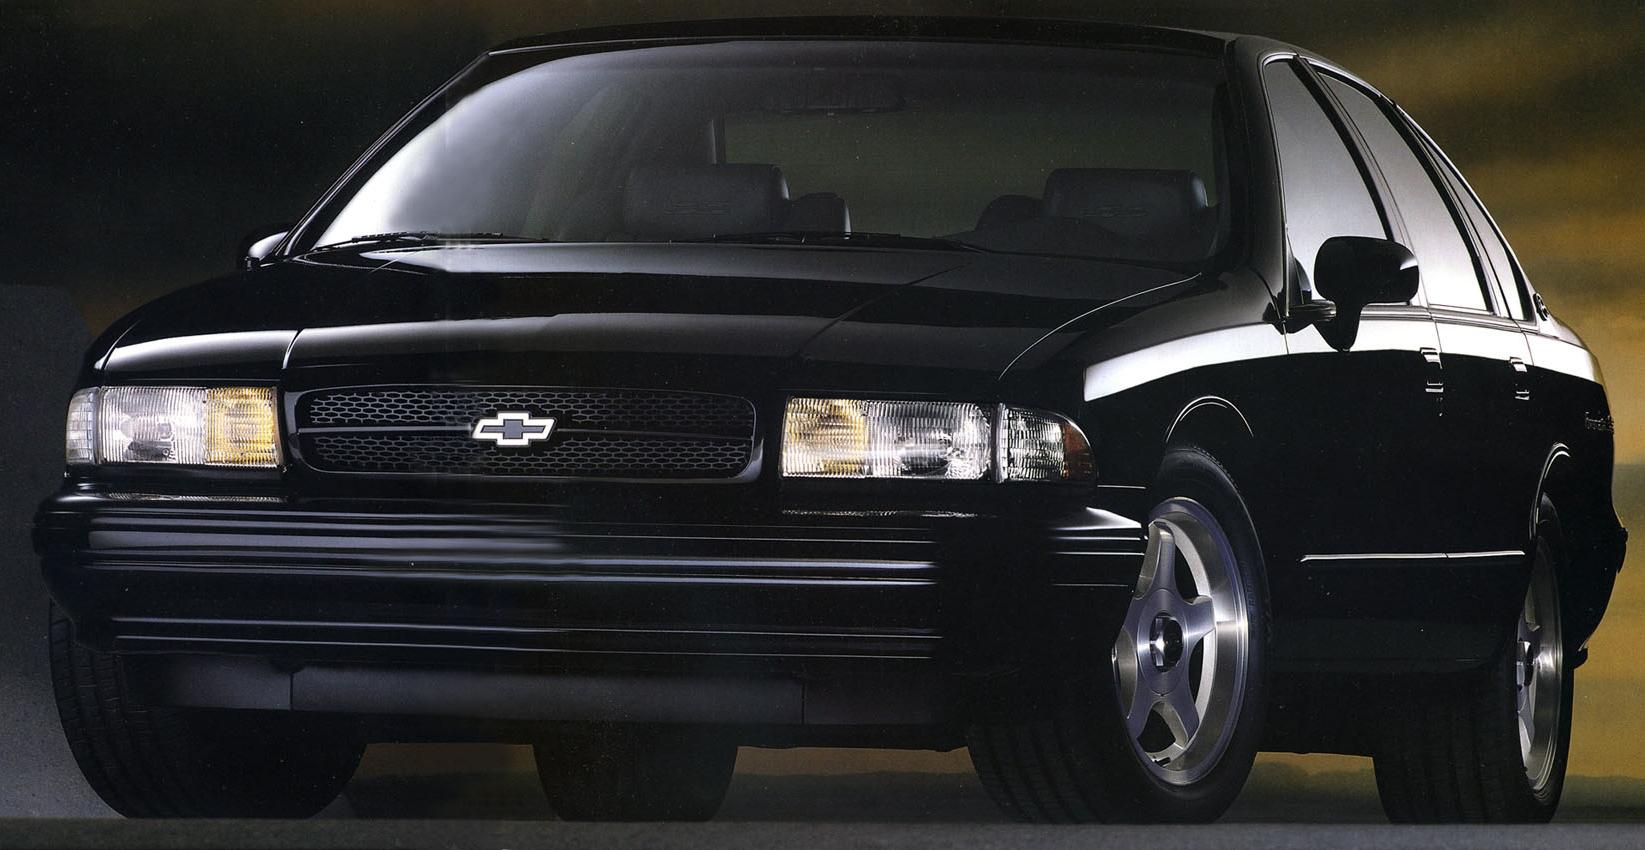 1994 1996 chevrolet impala ss horsepower memories. Black Bedroom Furniture Sets. Home Design Ideas